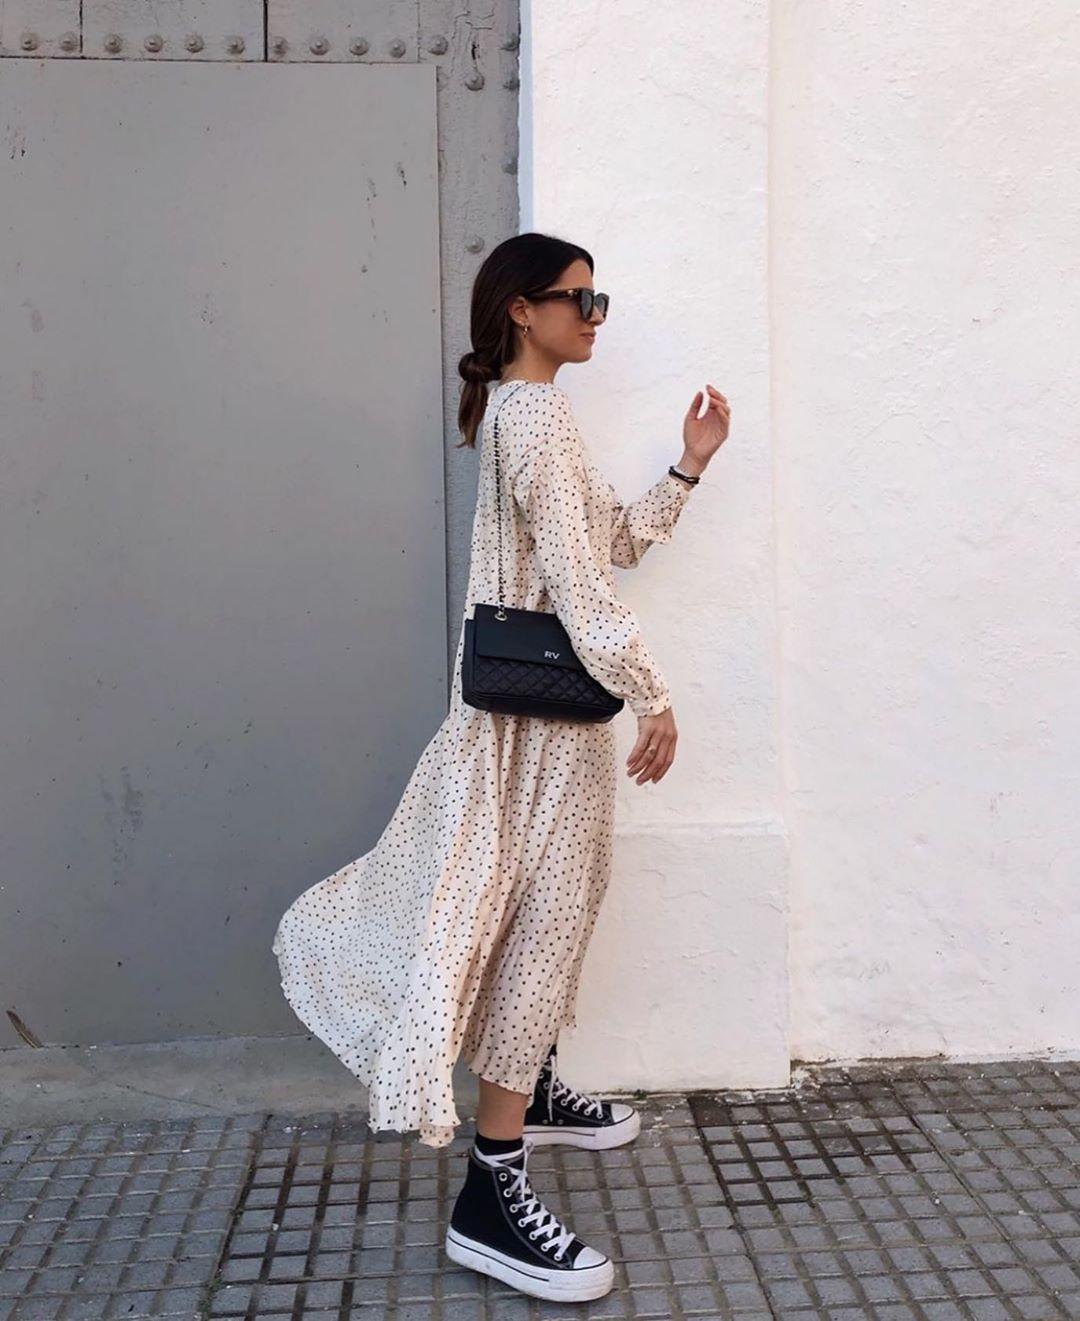 dress with crumpled effect de Zara sur zarastreetstyle